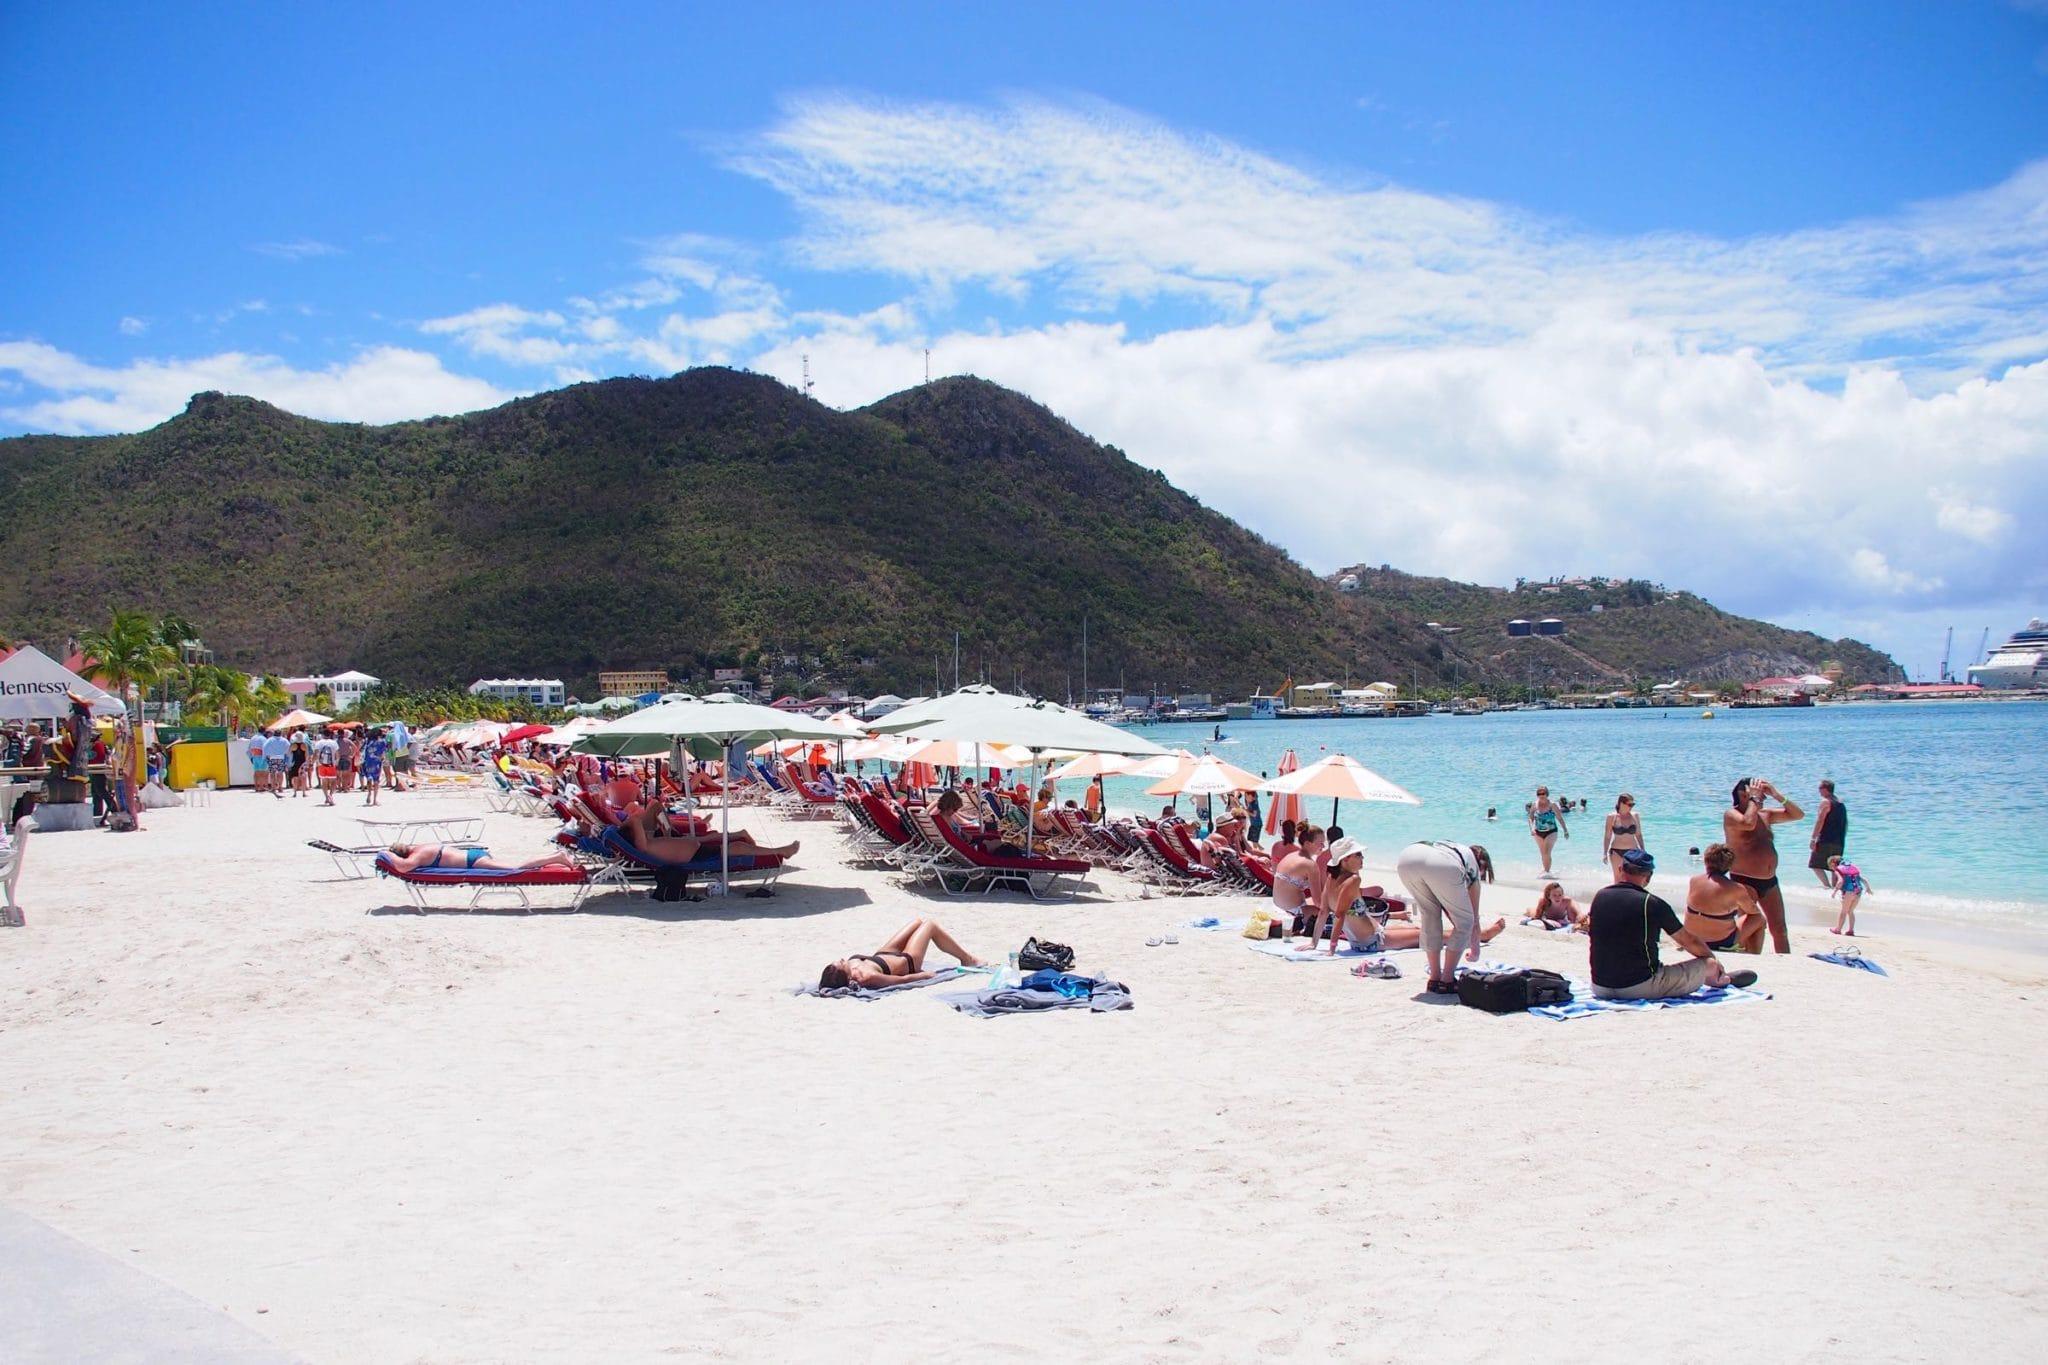 On the beach in Philipsburg, St. Maarten | SBPR